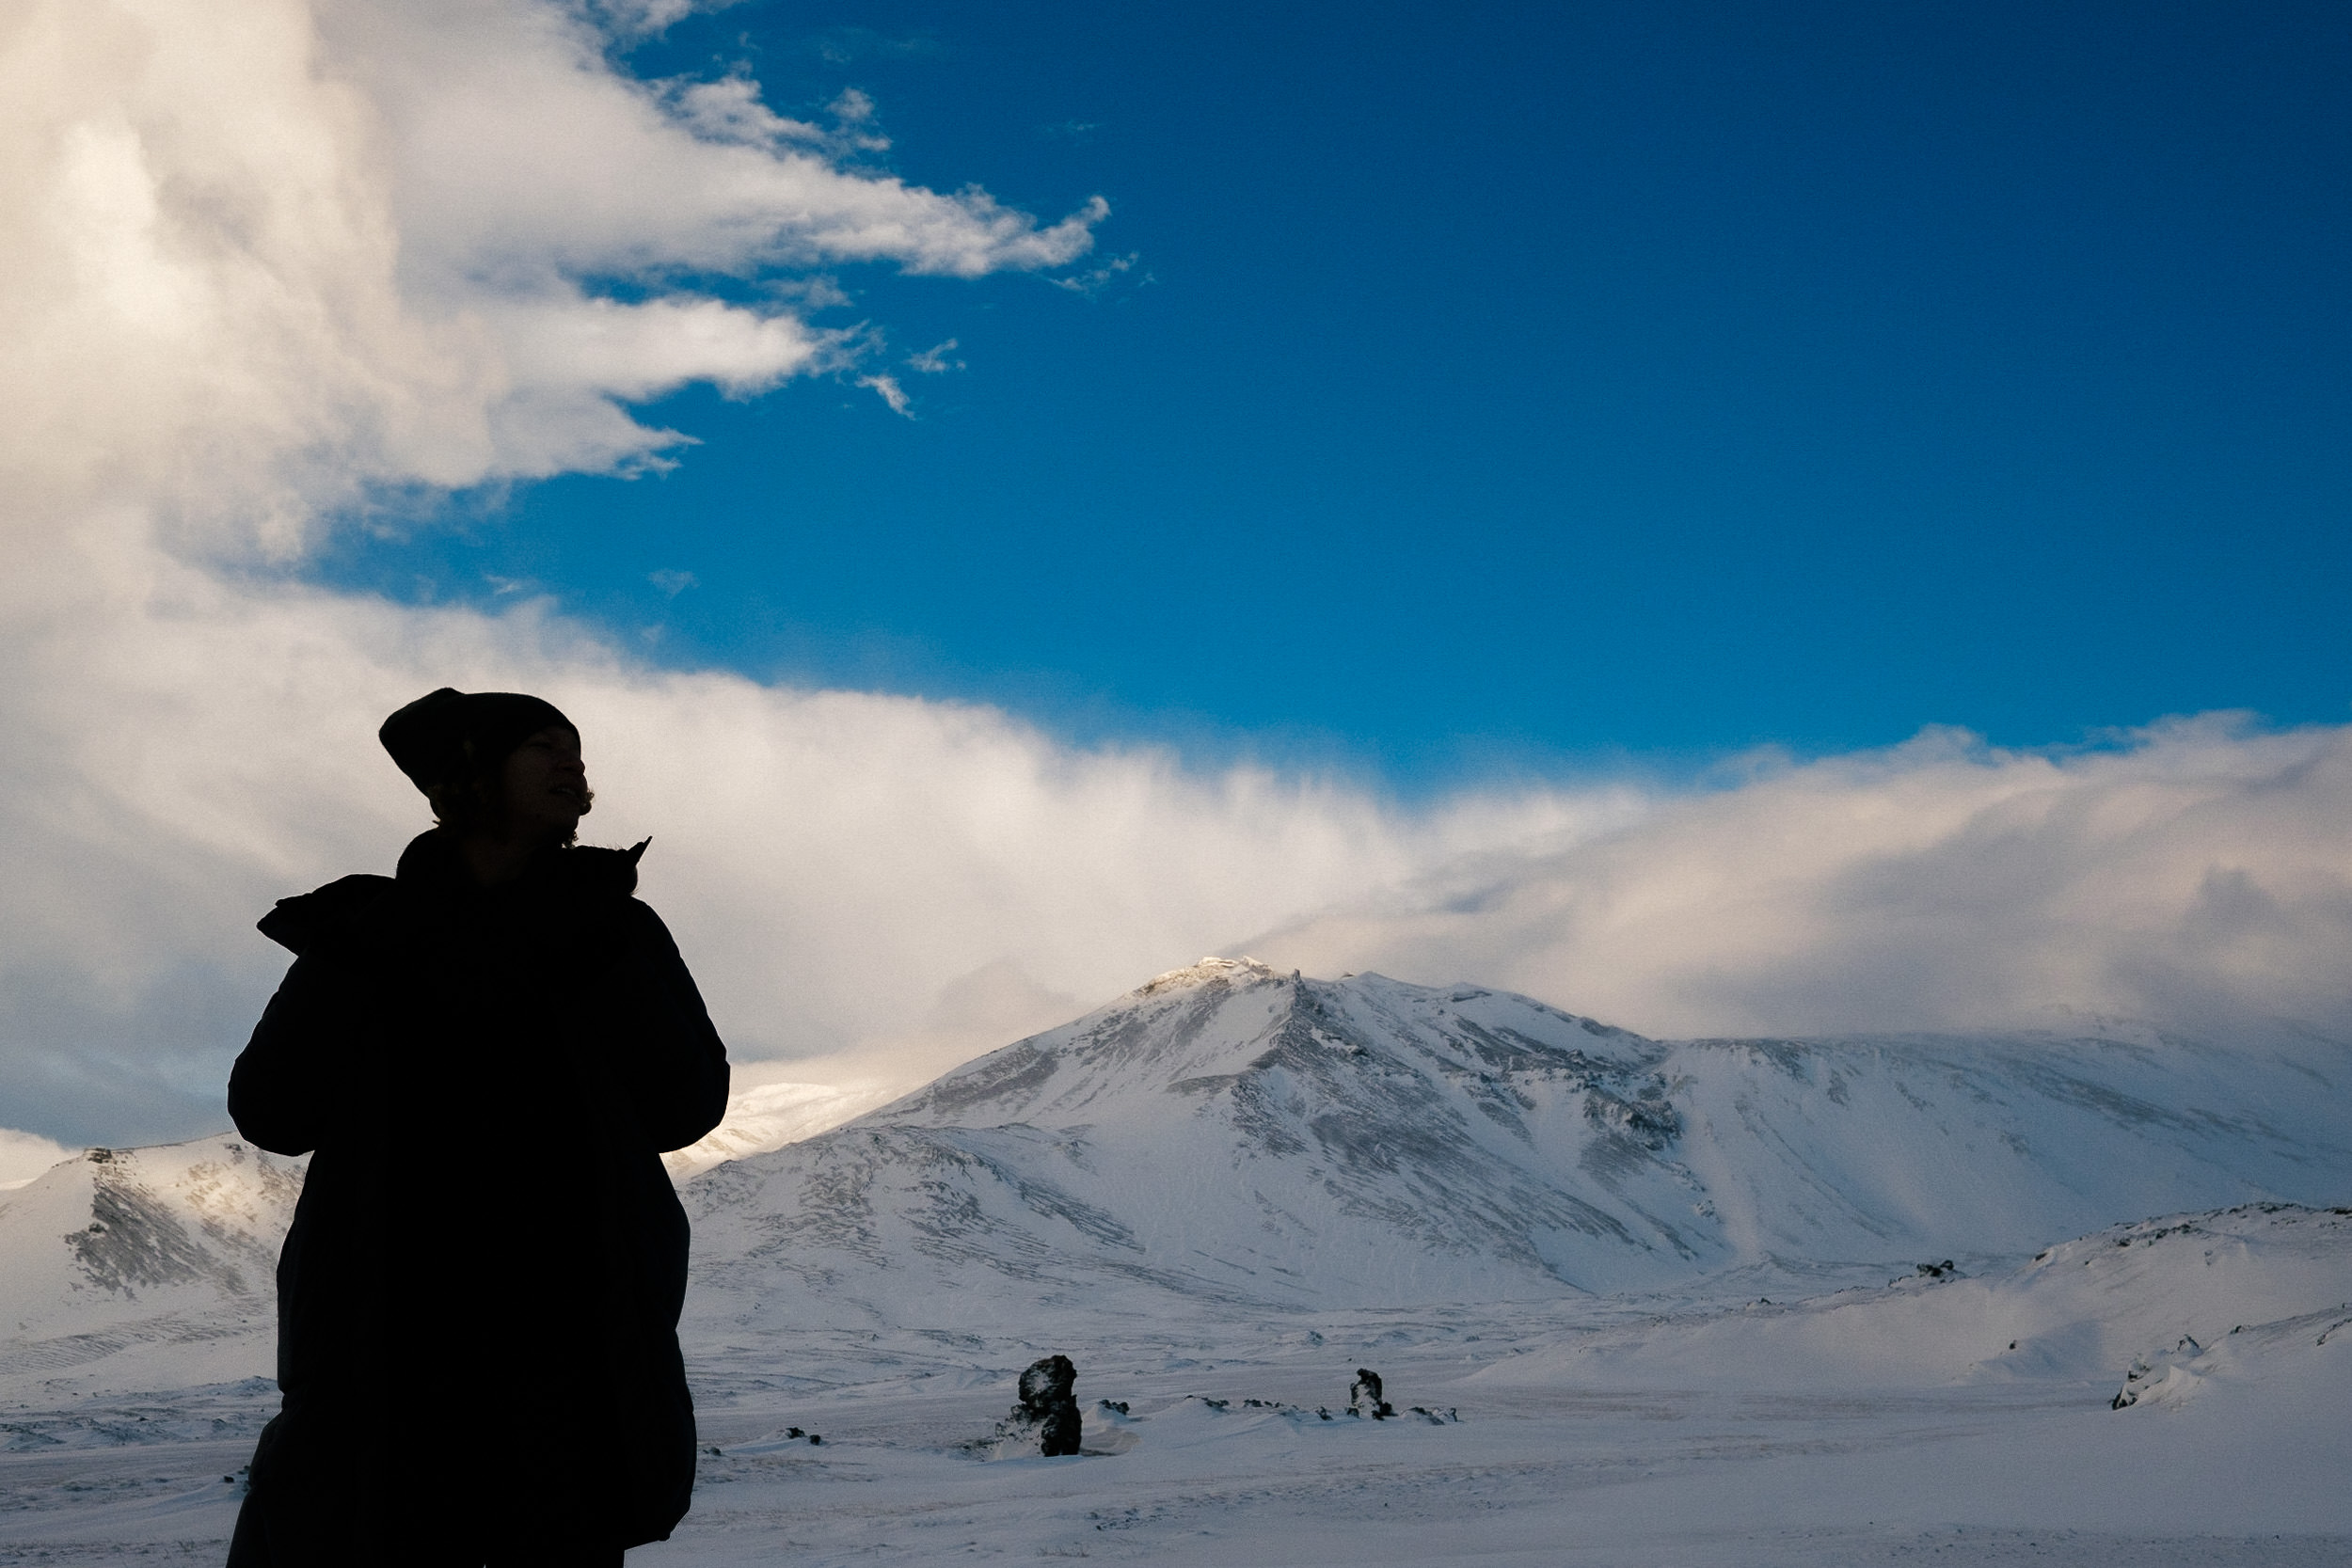 Collective_Wander_Iceland_Photographers_Trip_030.jpg